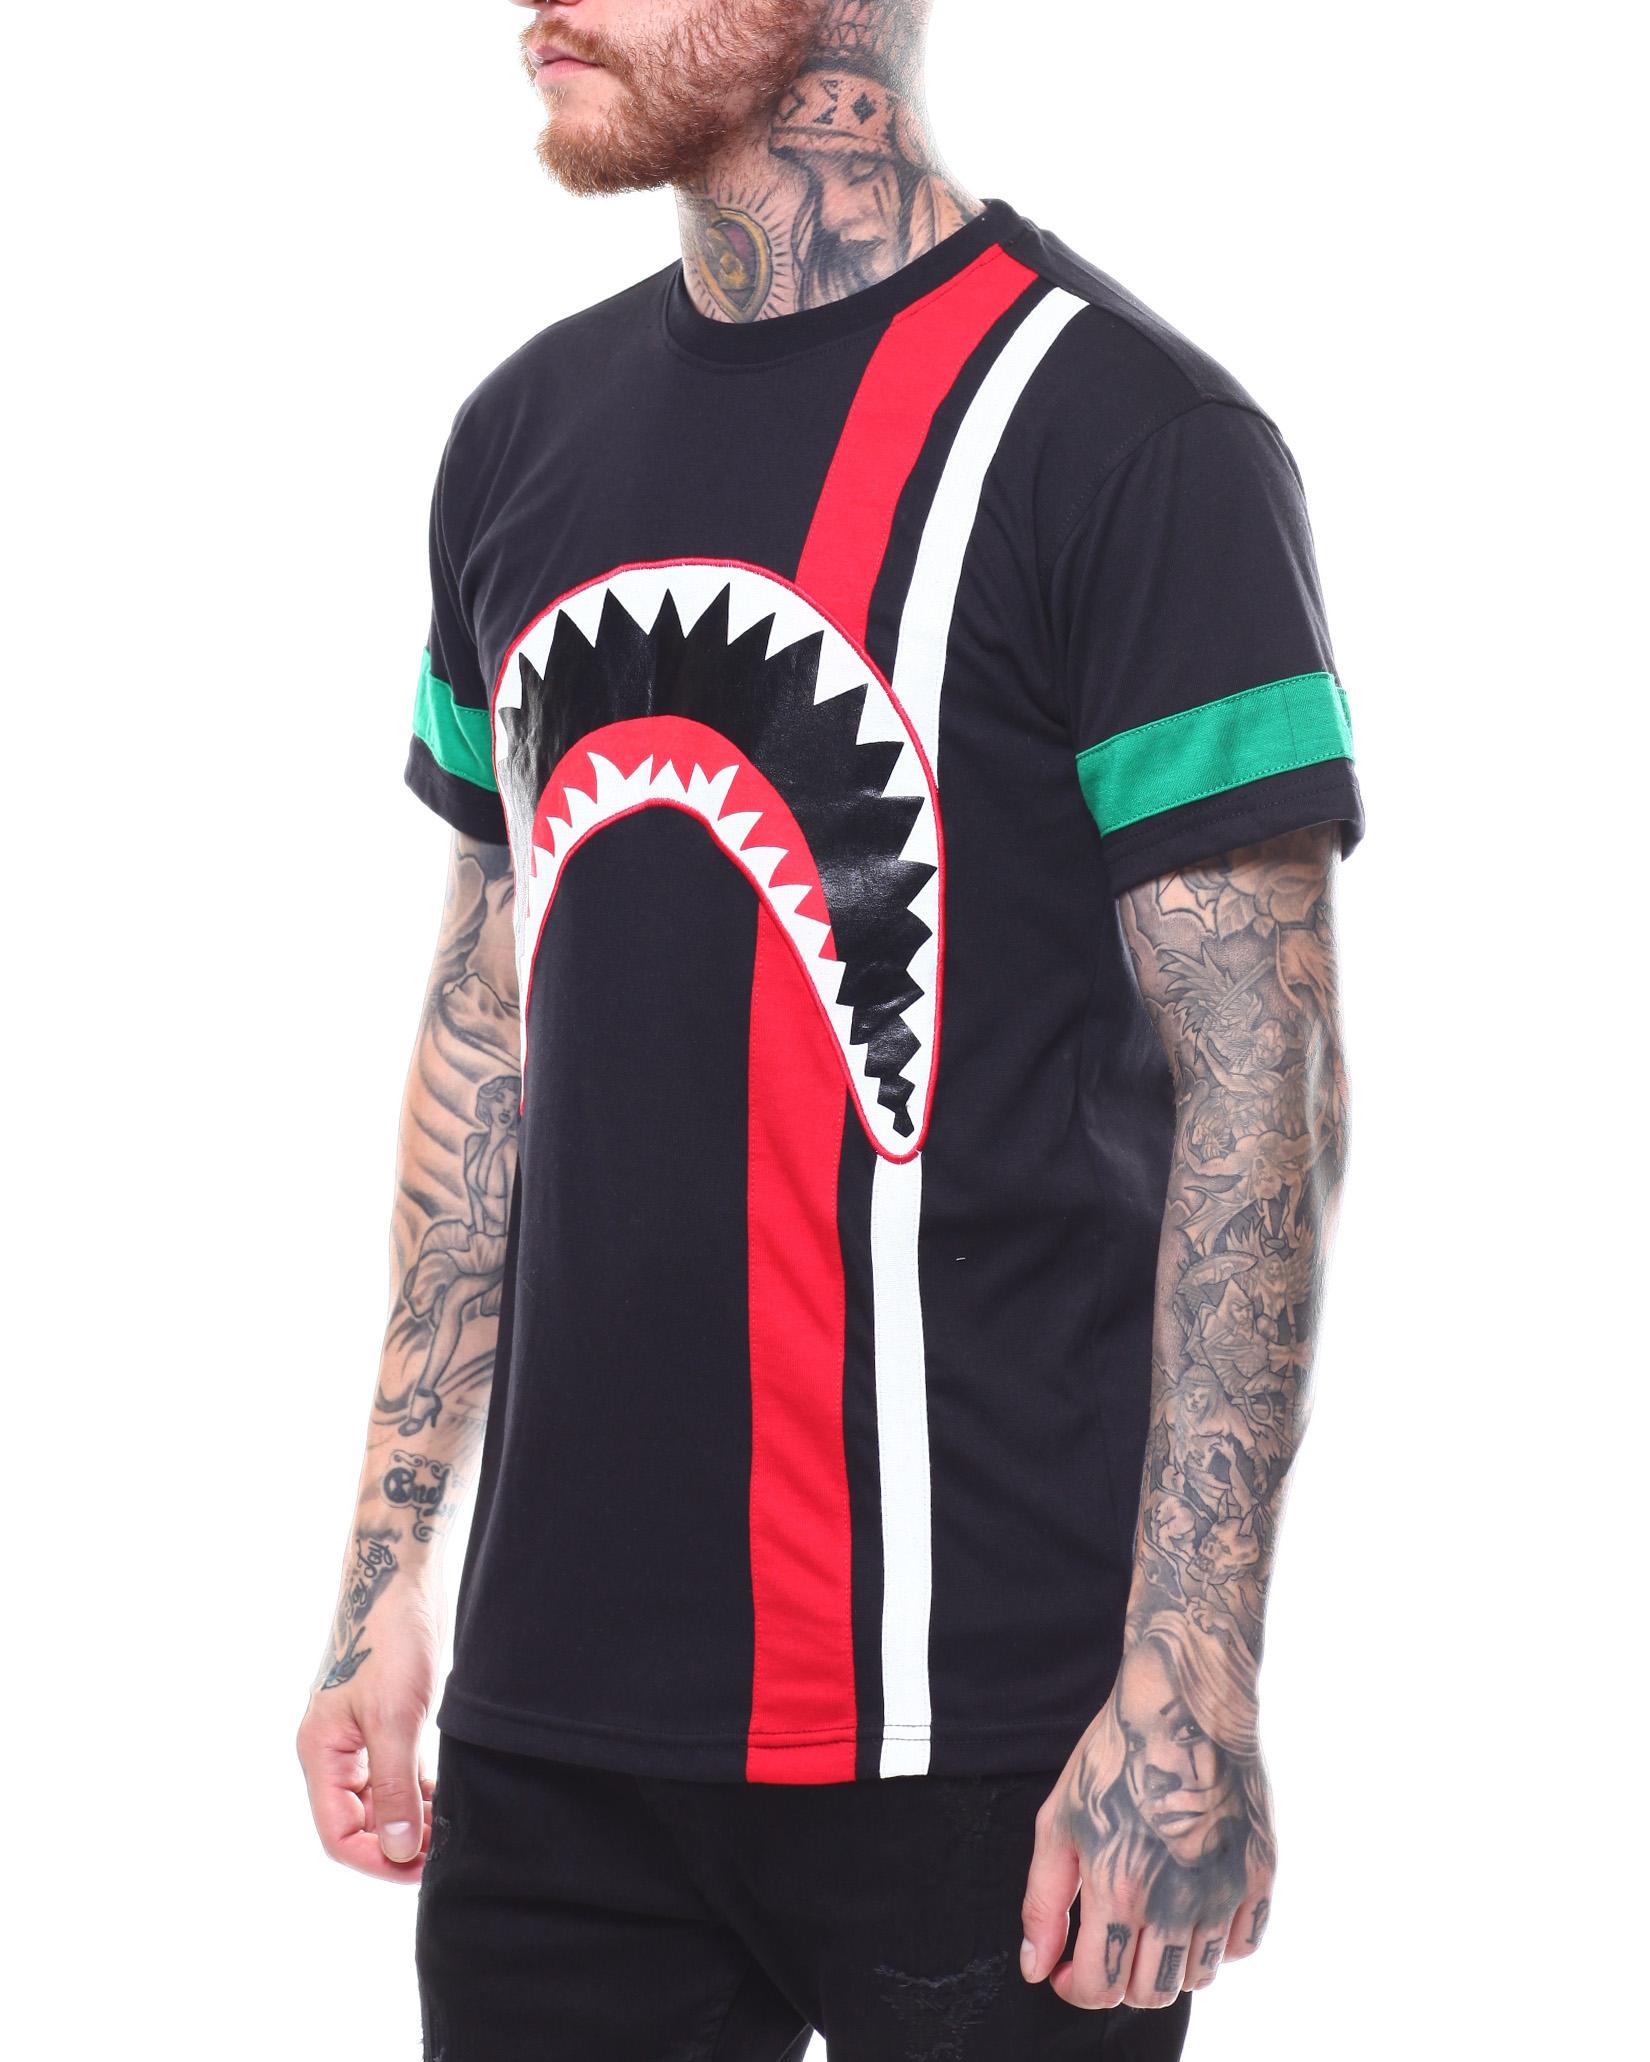 b56cc9dc0362 Buy COLORBLOCK SHARK TEE Men's Shirts from Buyers Picks. Find Buyers ...